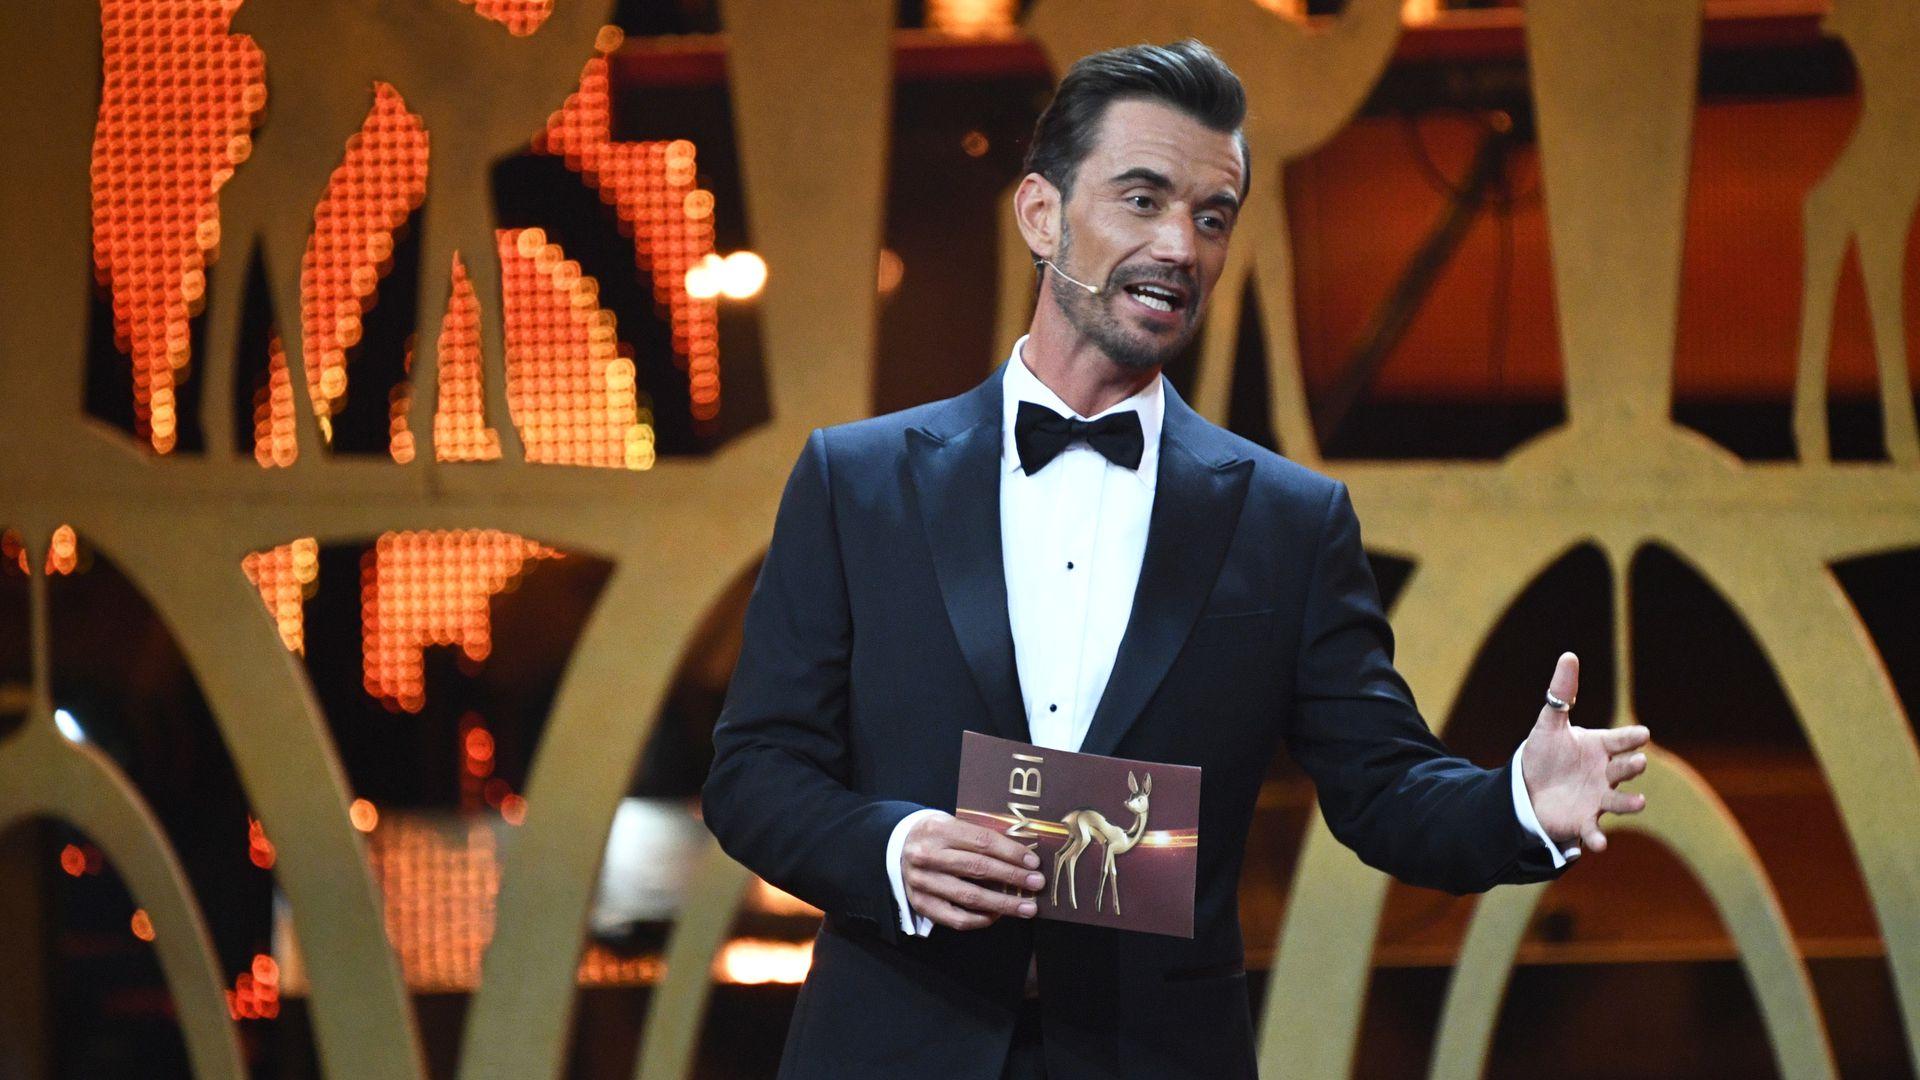 Bei Bambi 2018: Wo ist Moderator Florian Silbereisen hin?